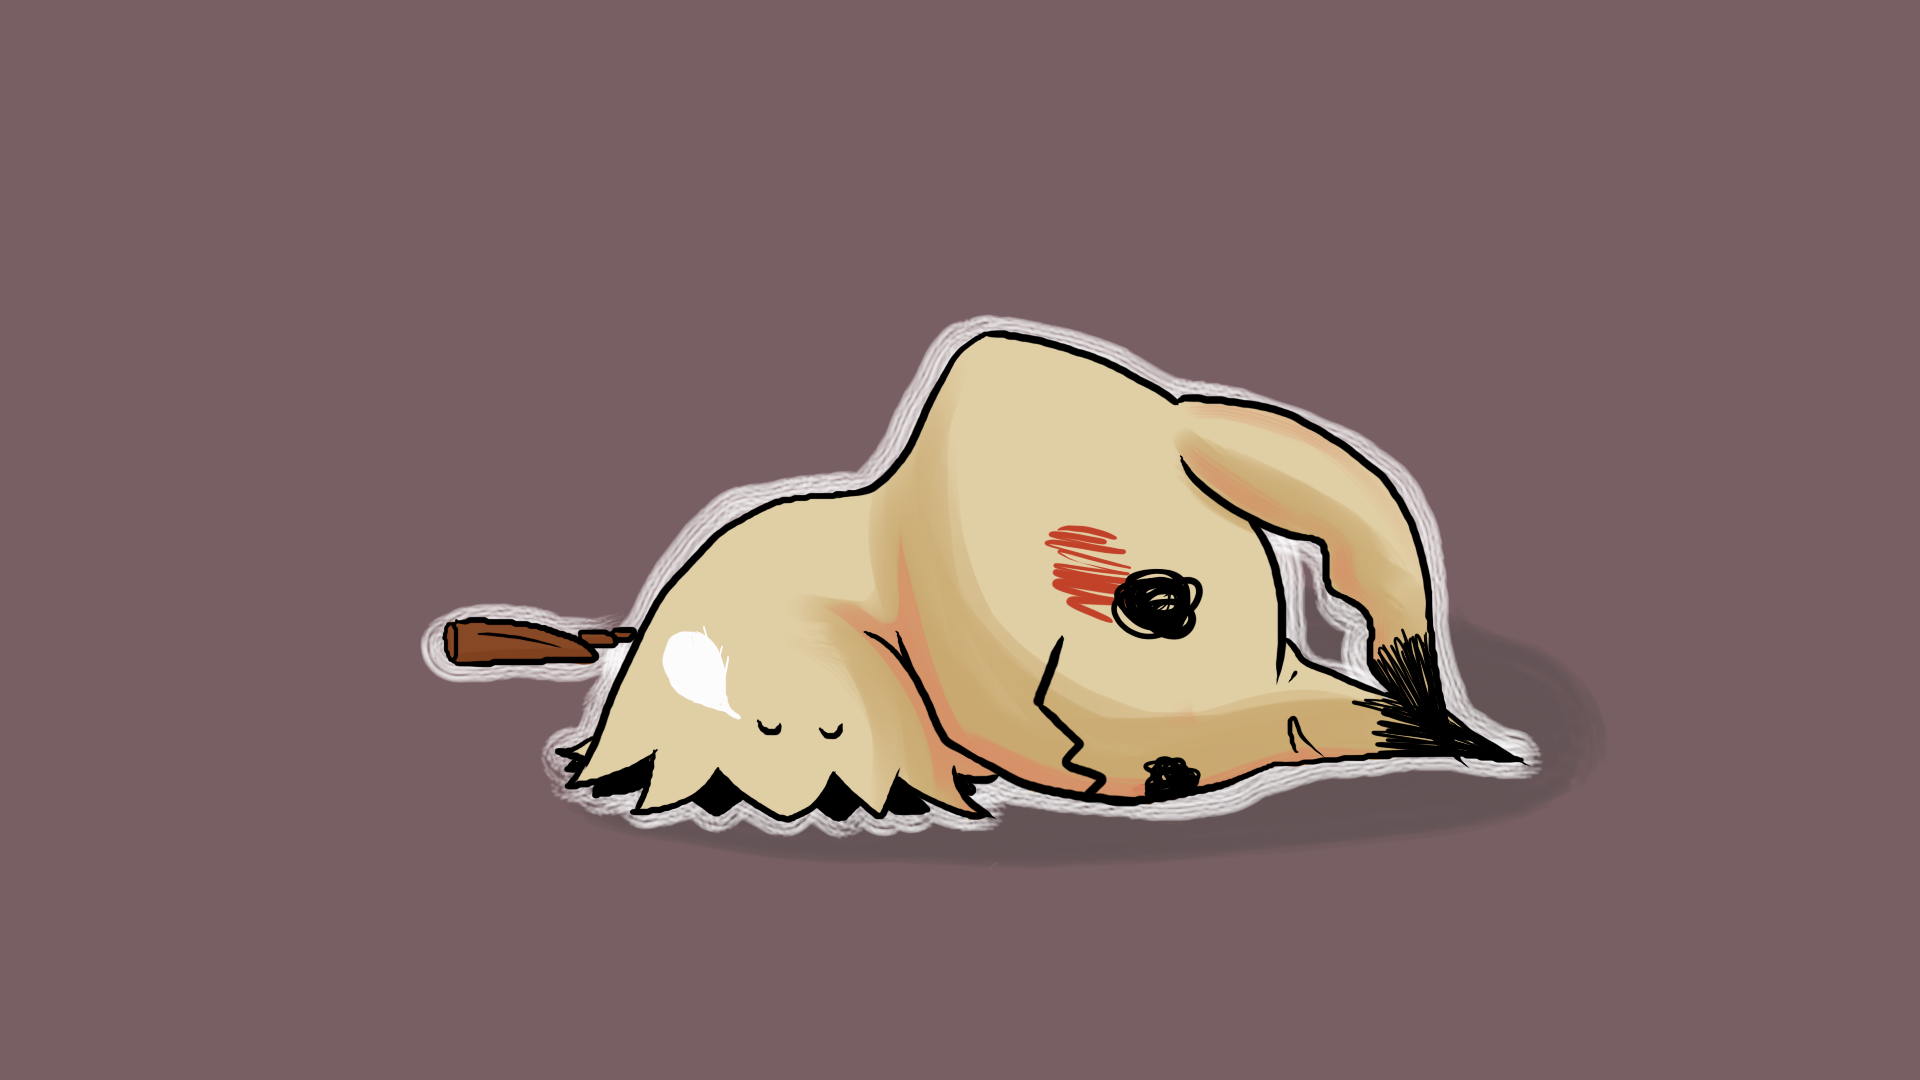 Mimikyu is tired